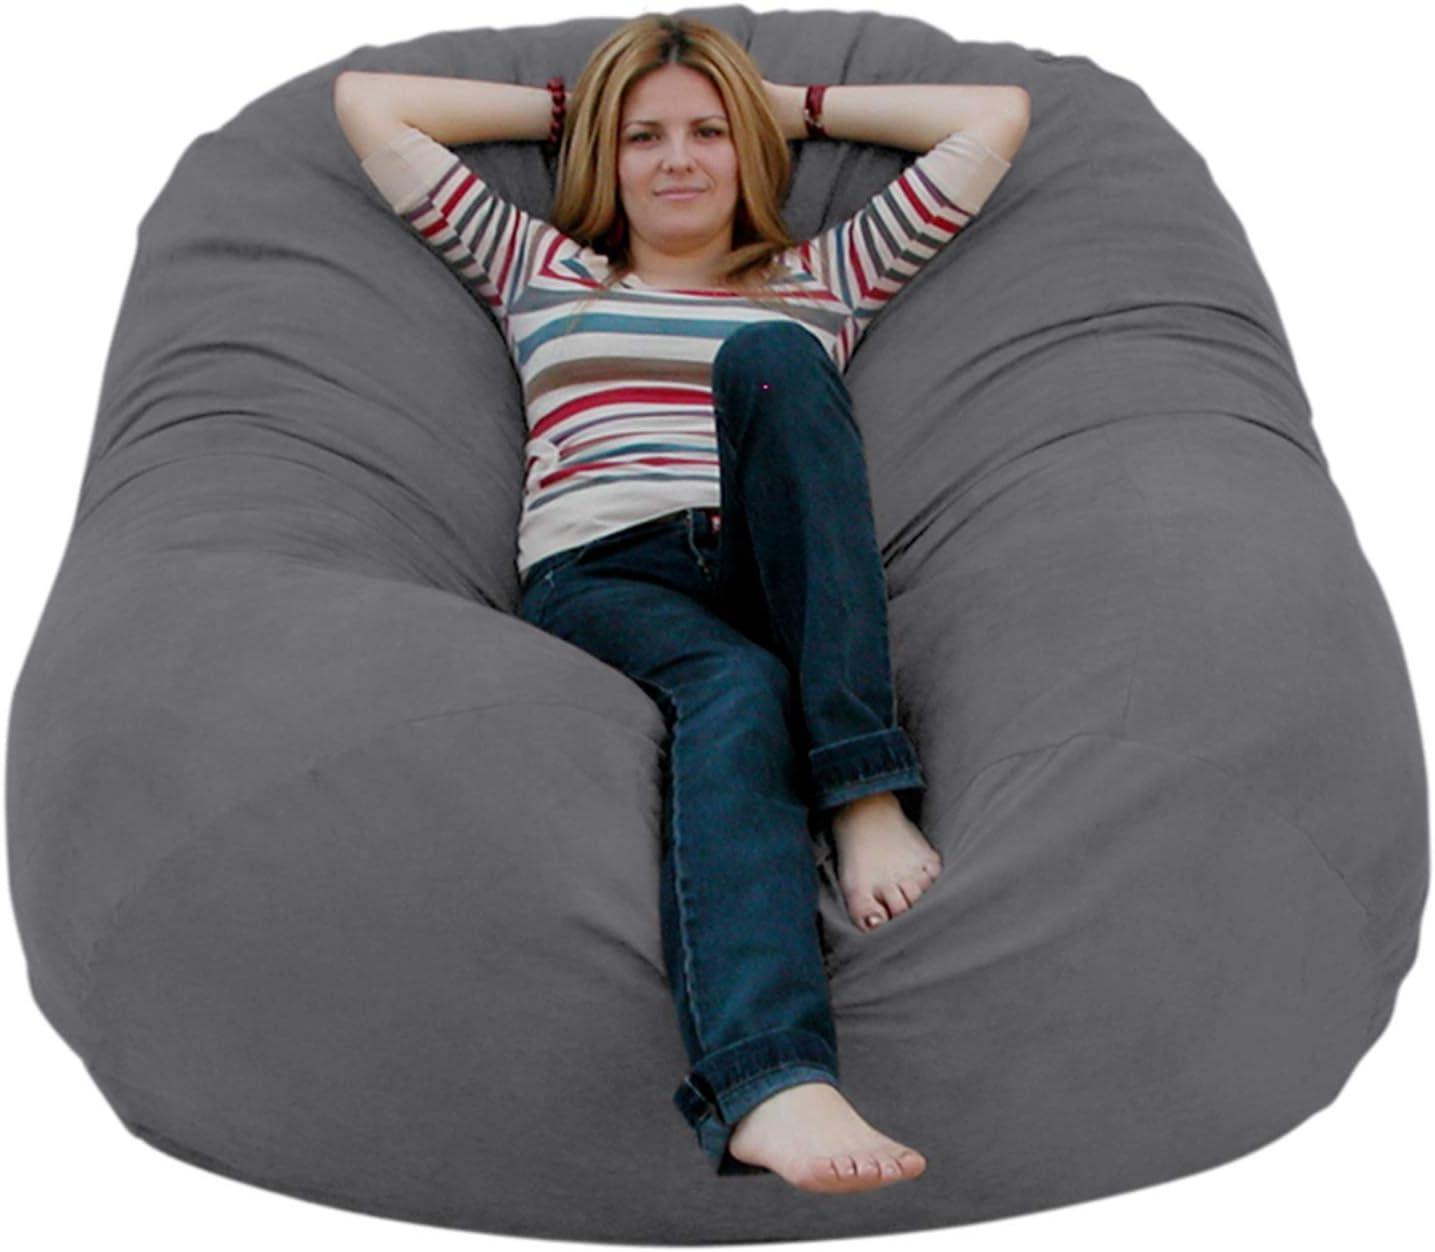 Amazon Com Cozy Sack 6 Feet Bean Bag Chair Large Grey Furniture Decor